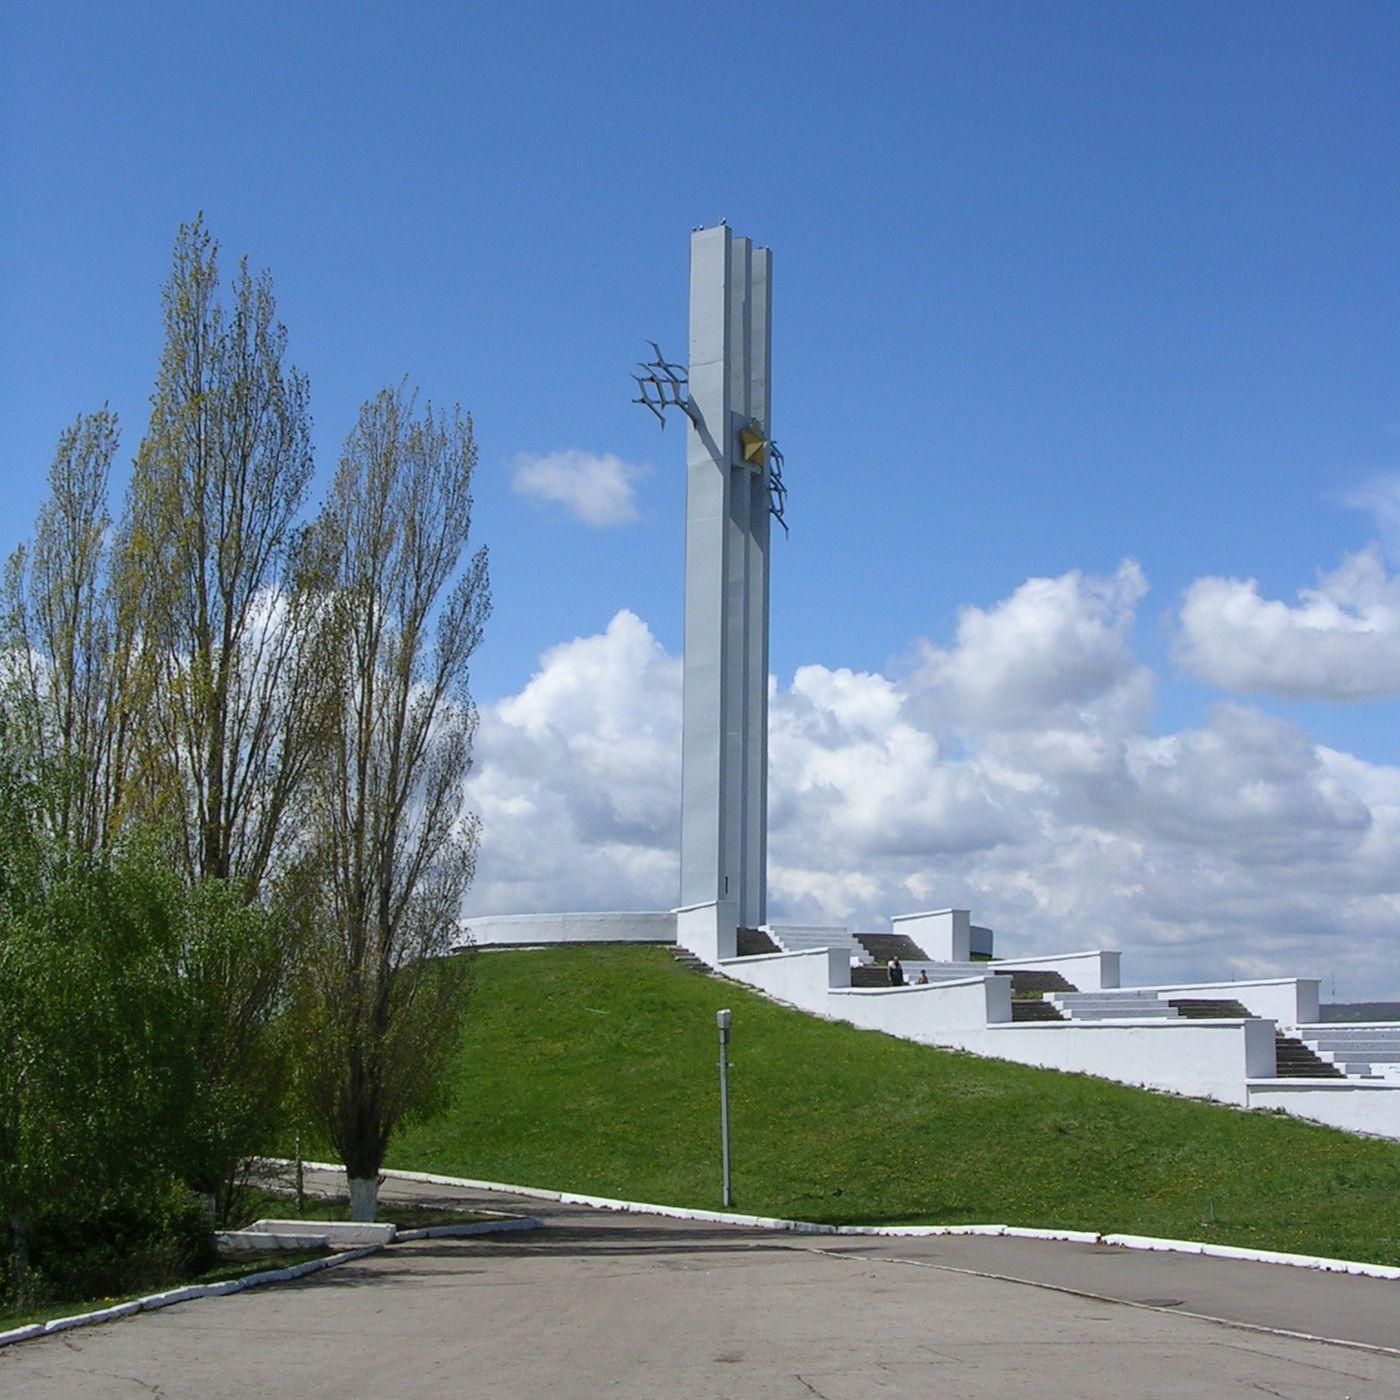 http://interesnoe.info/pictures/gallery/gallery/Saratov_Sokol1.jpg